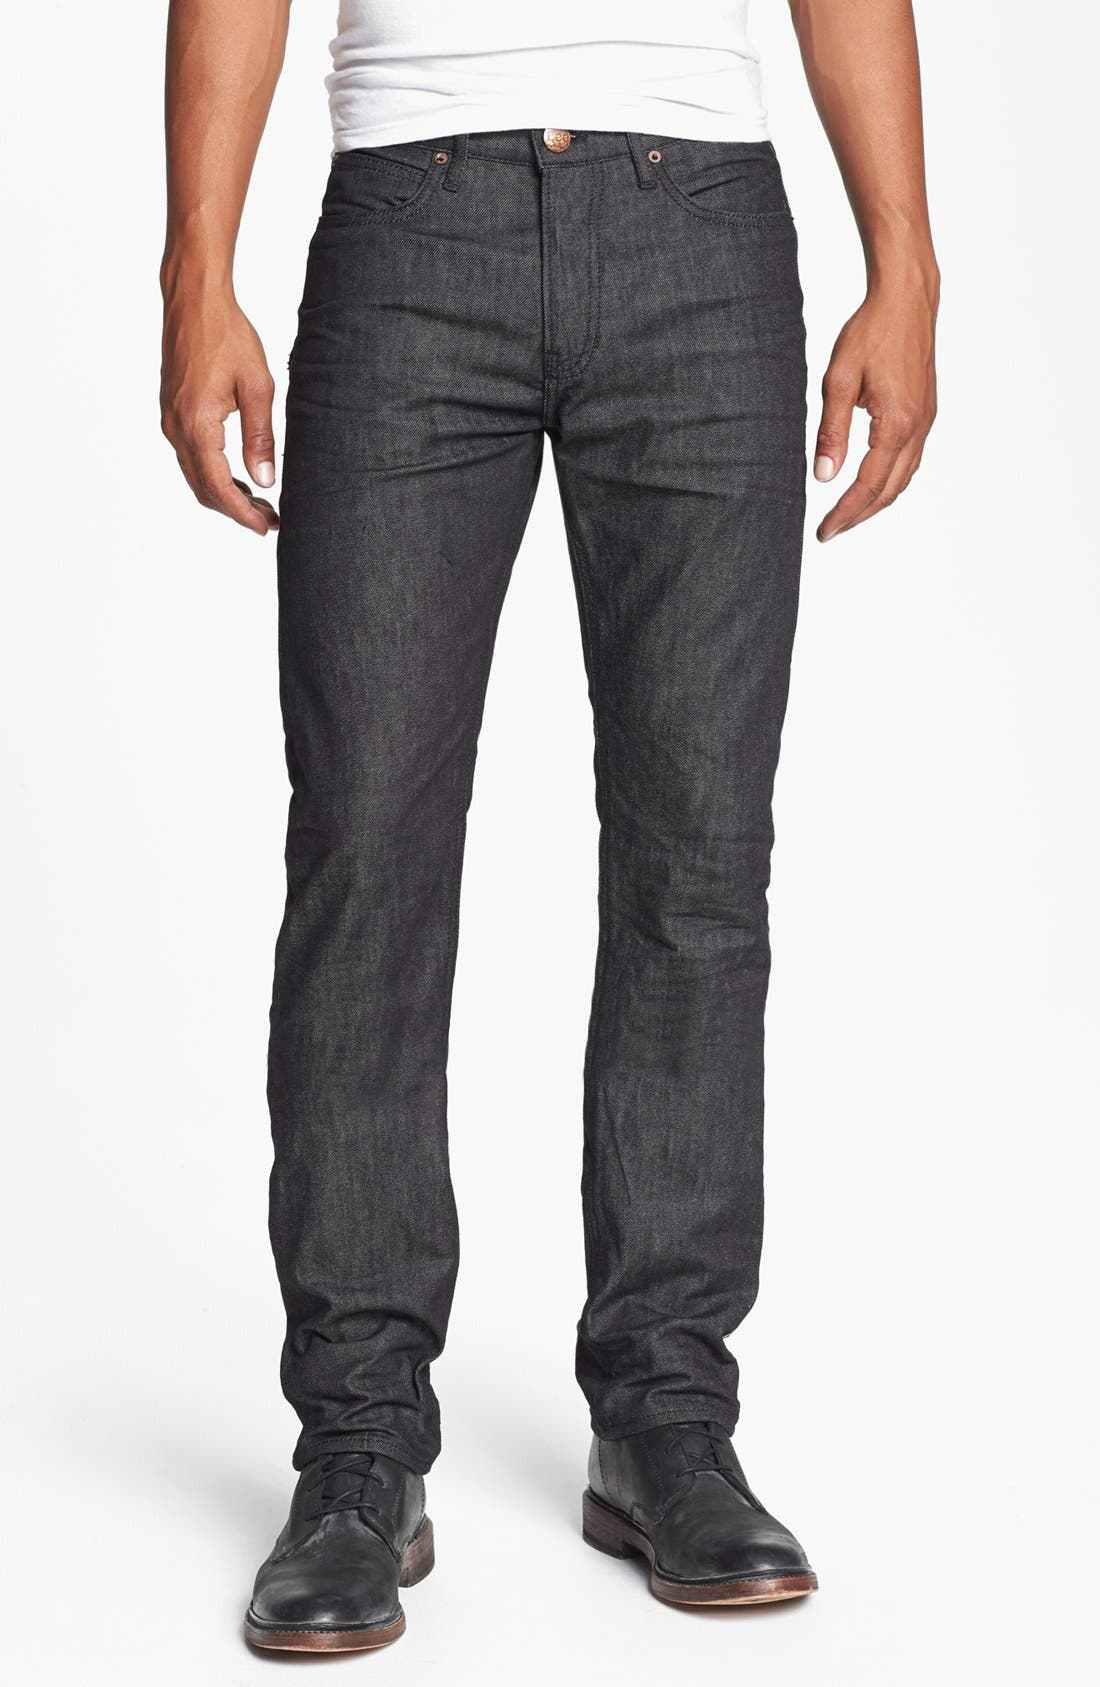 Main Image - Lee 101 USA 'Lean' Straight Leg Jeans (Black Wet)